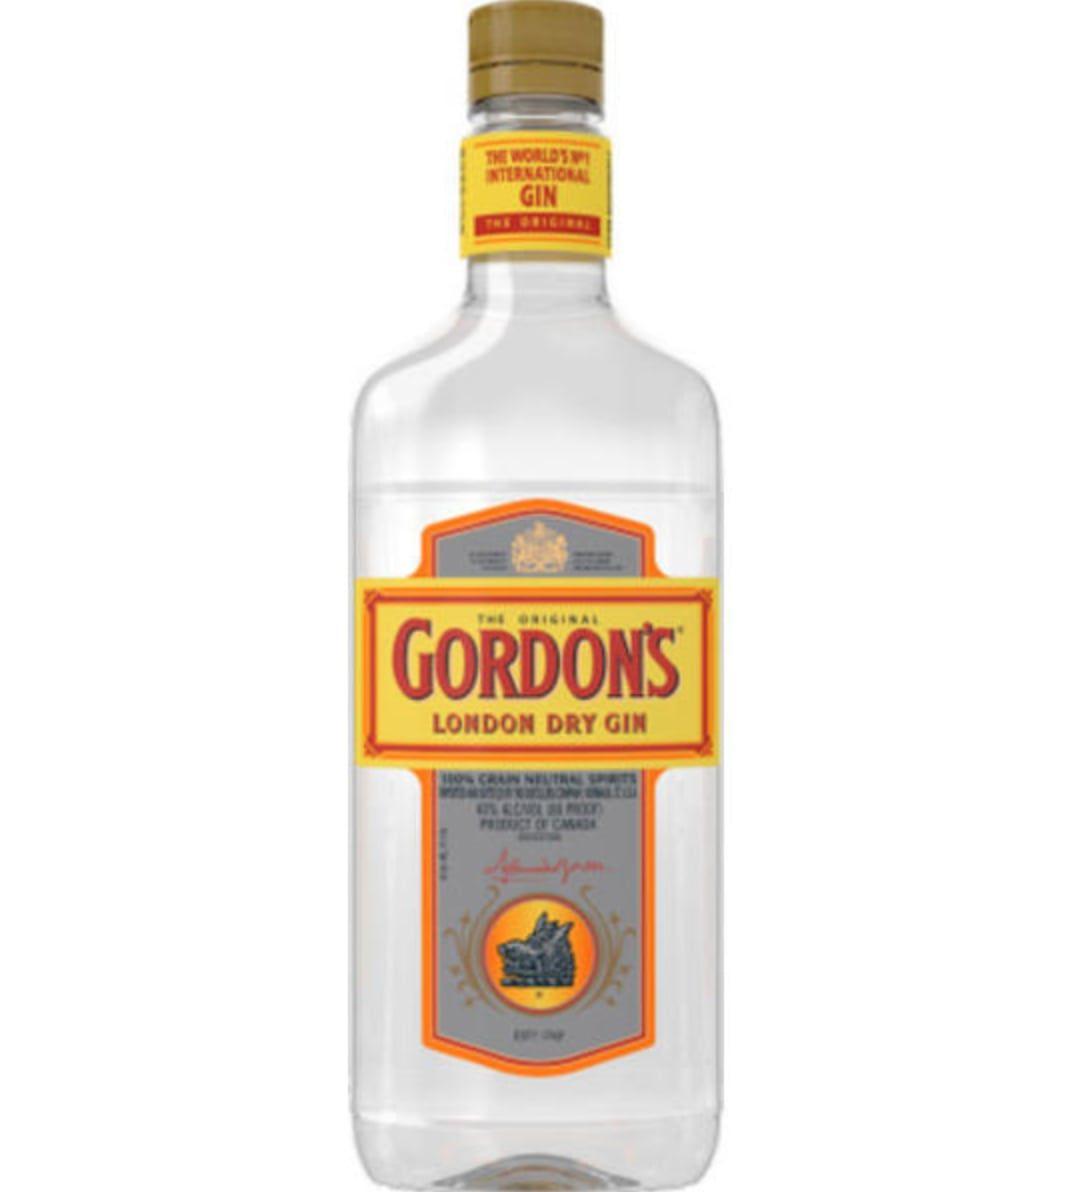 gordons-london-dry-gin